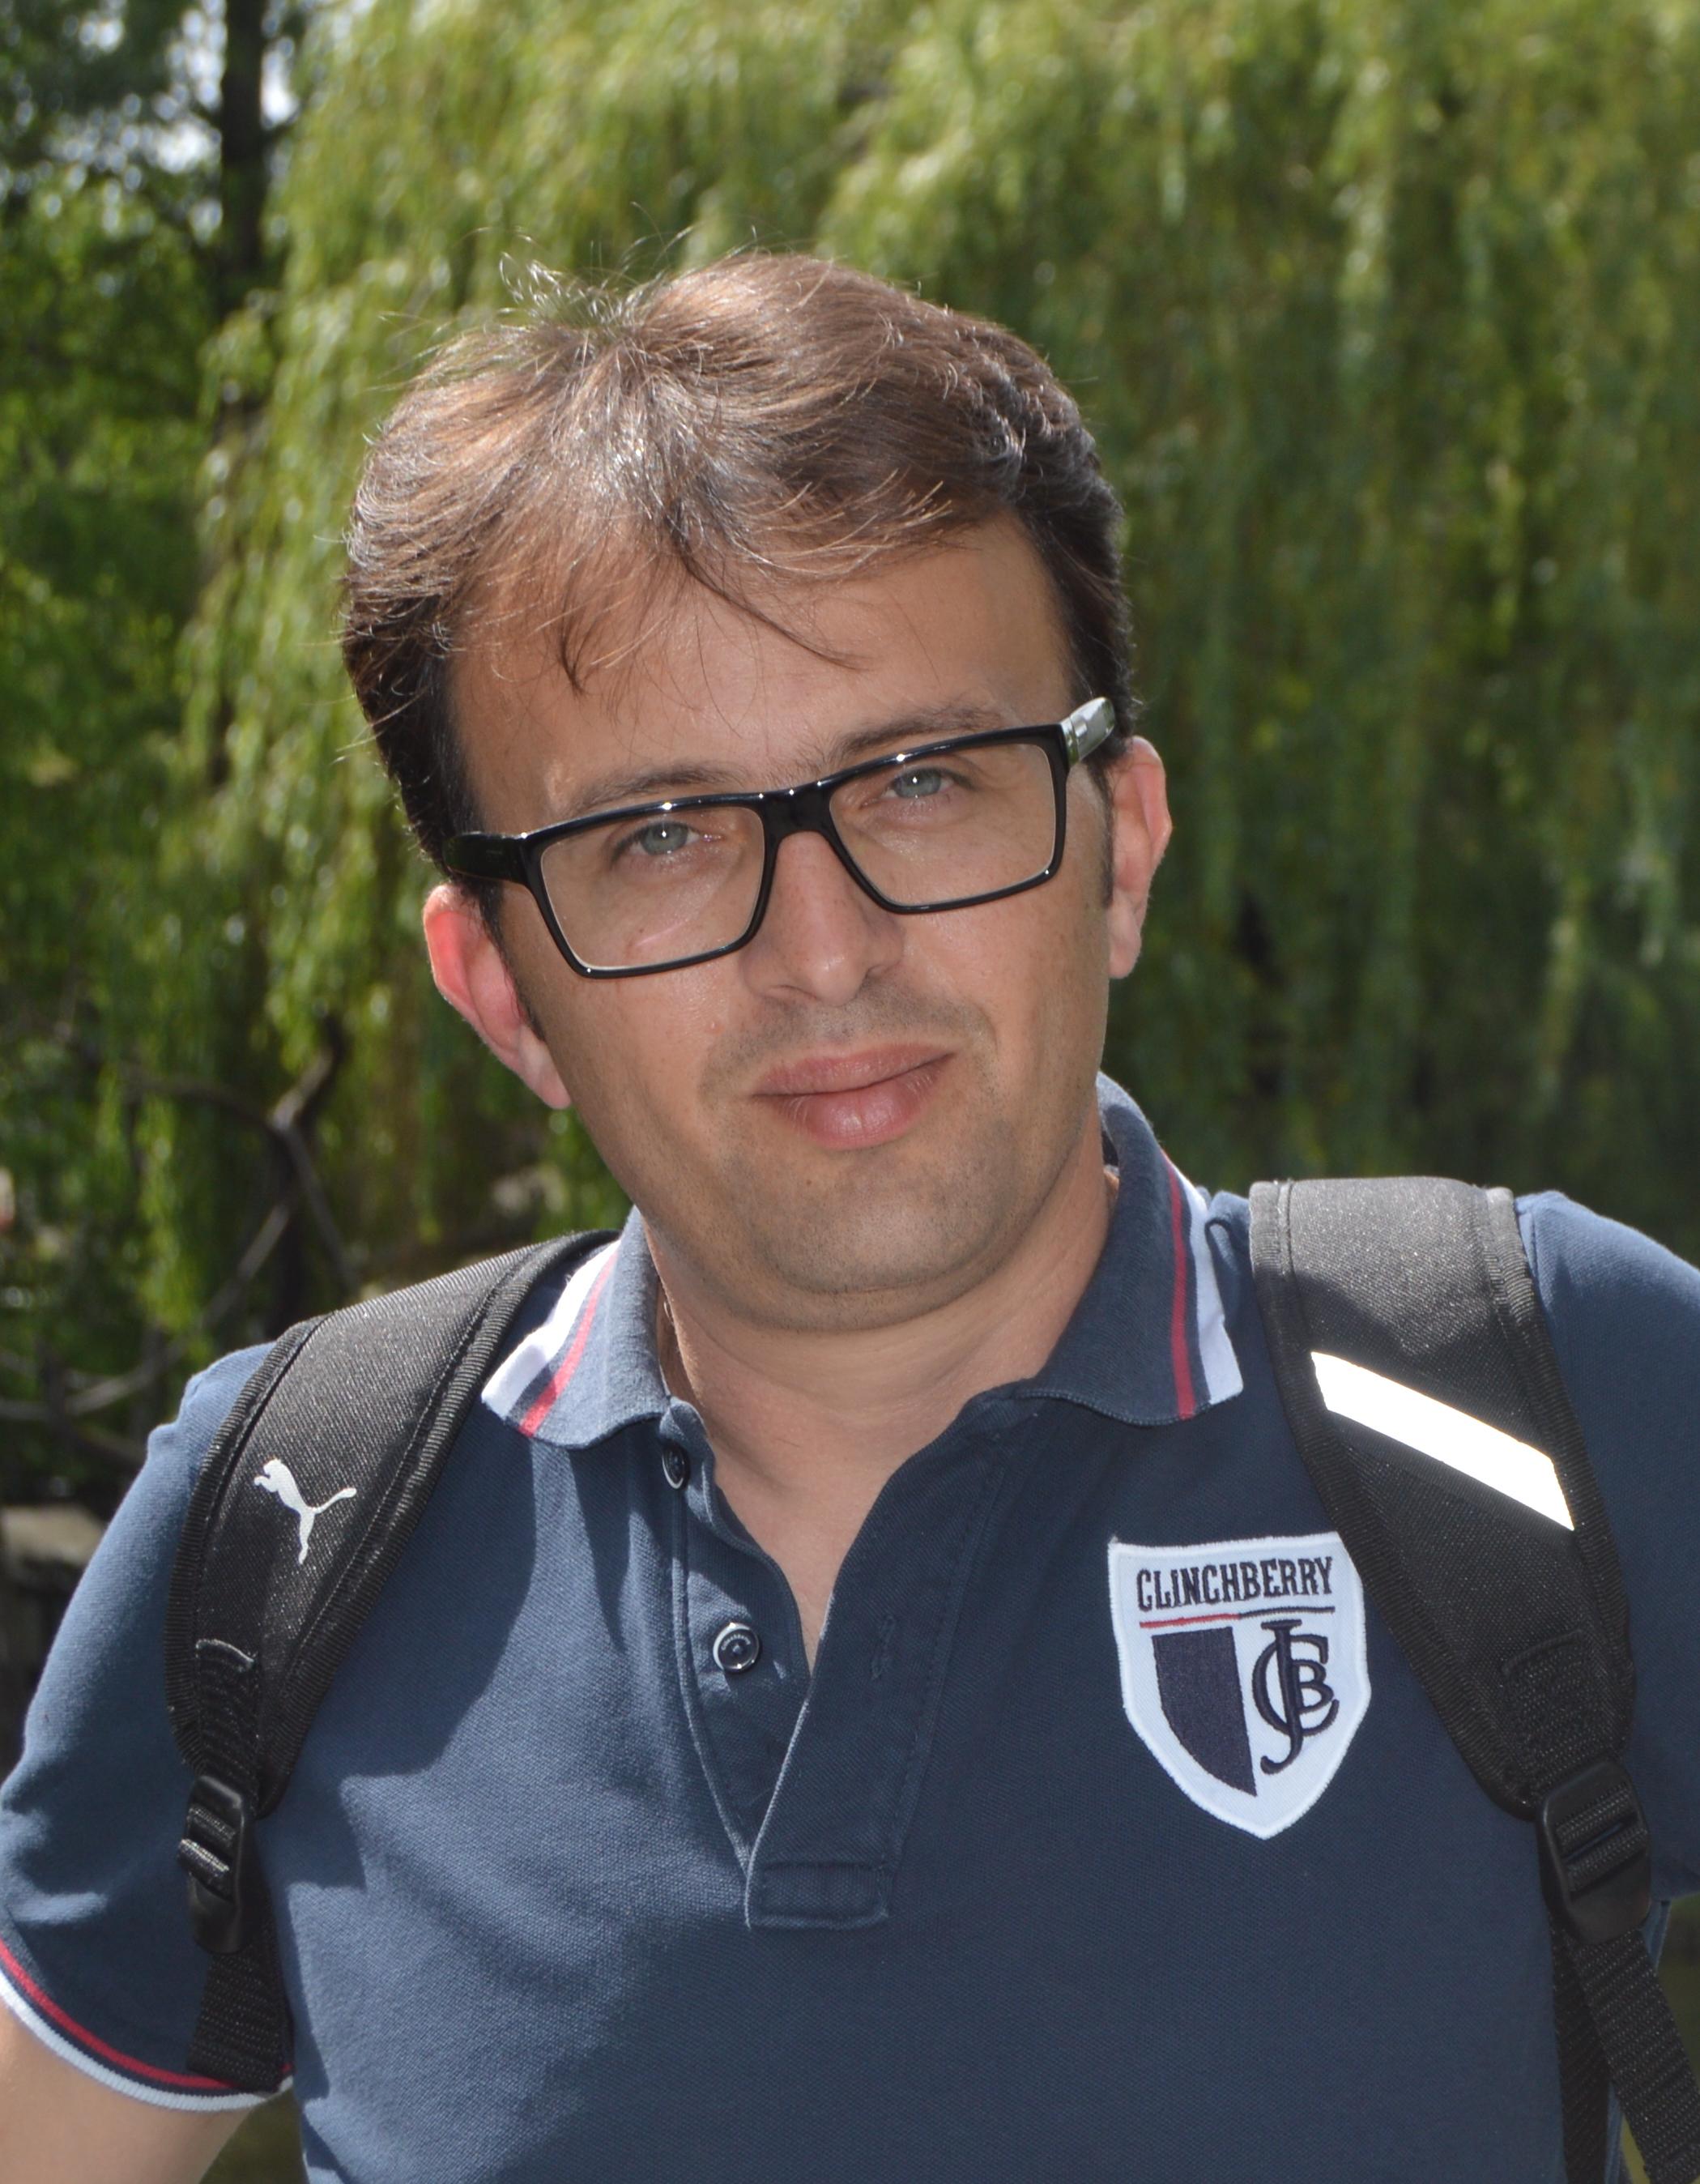 Antonio Destratis